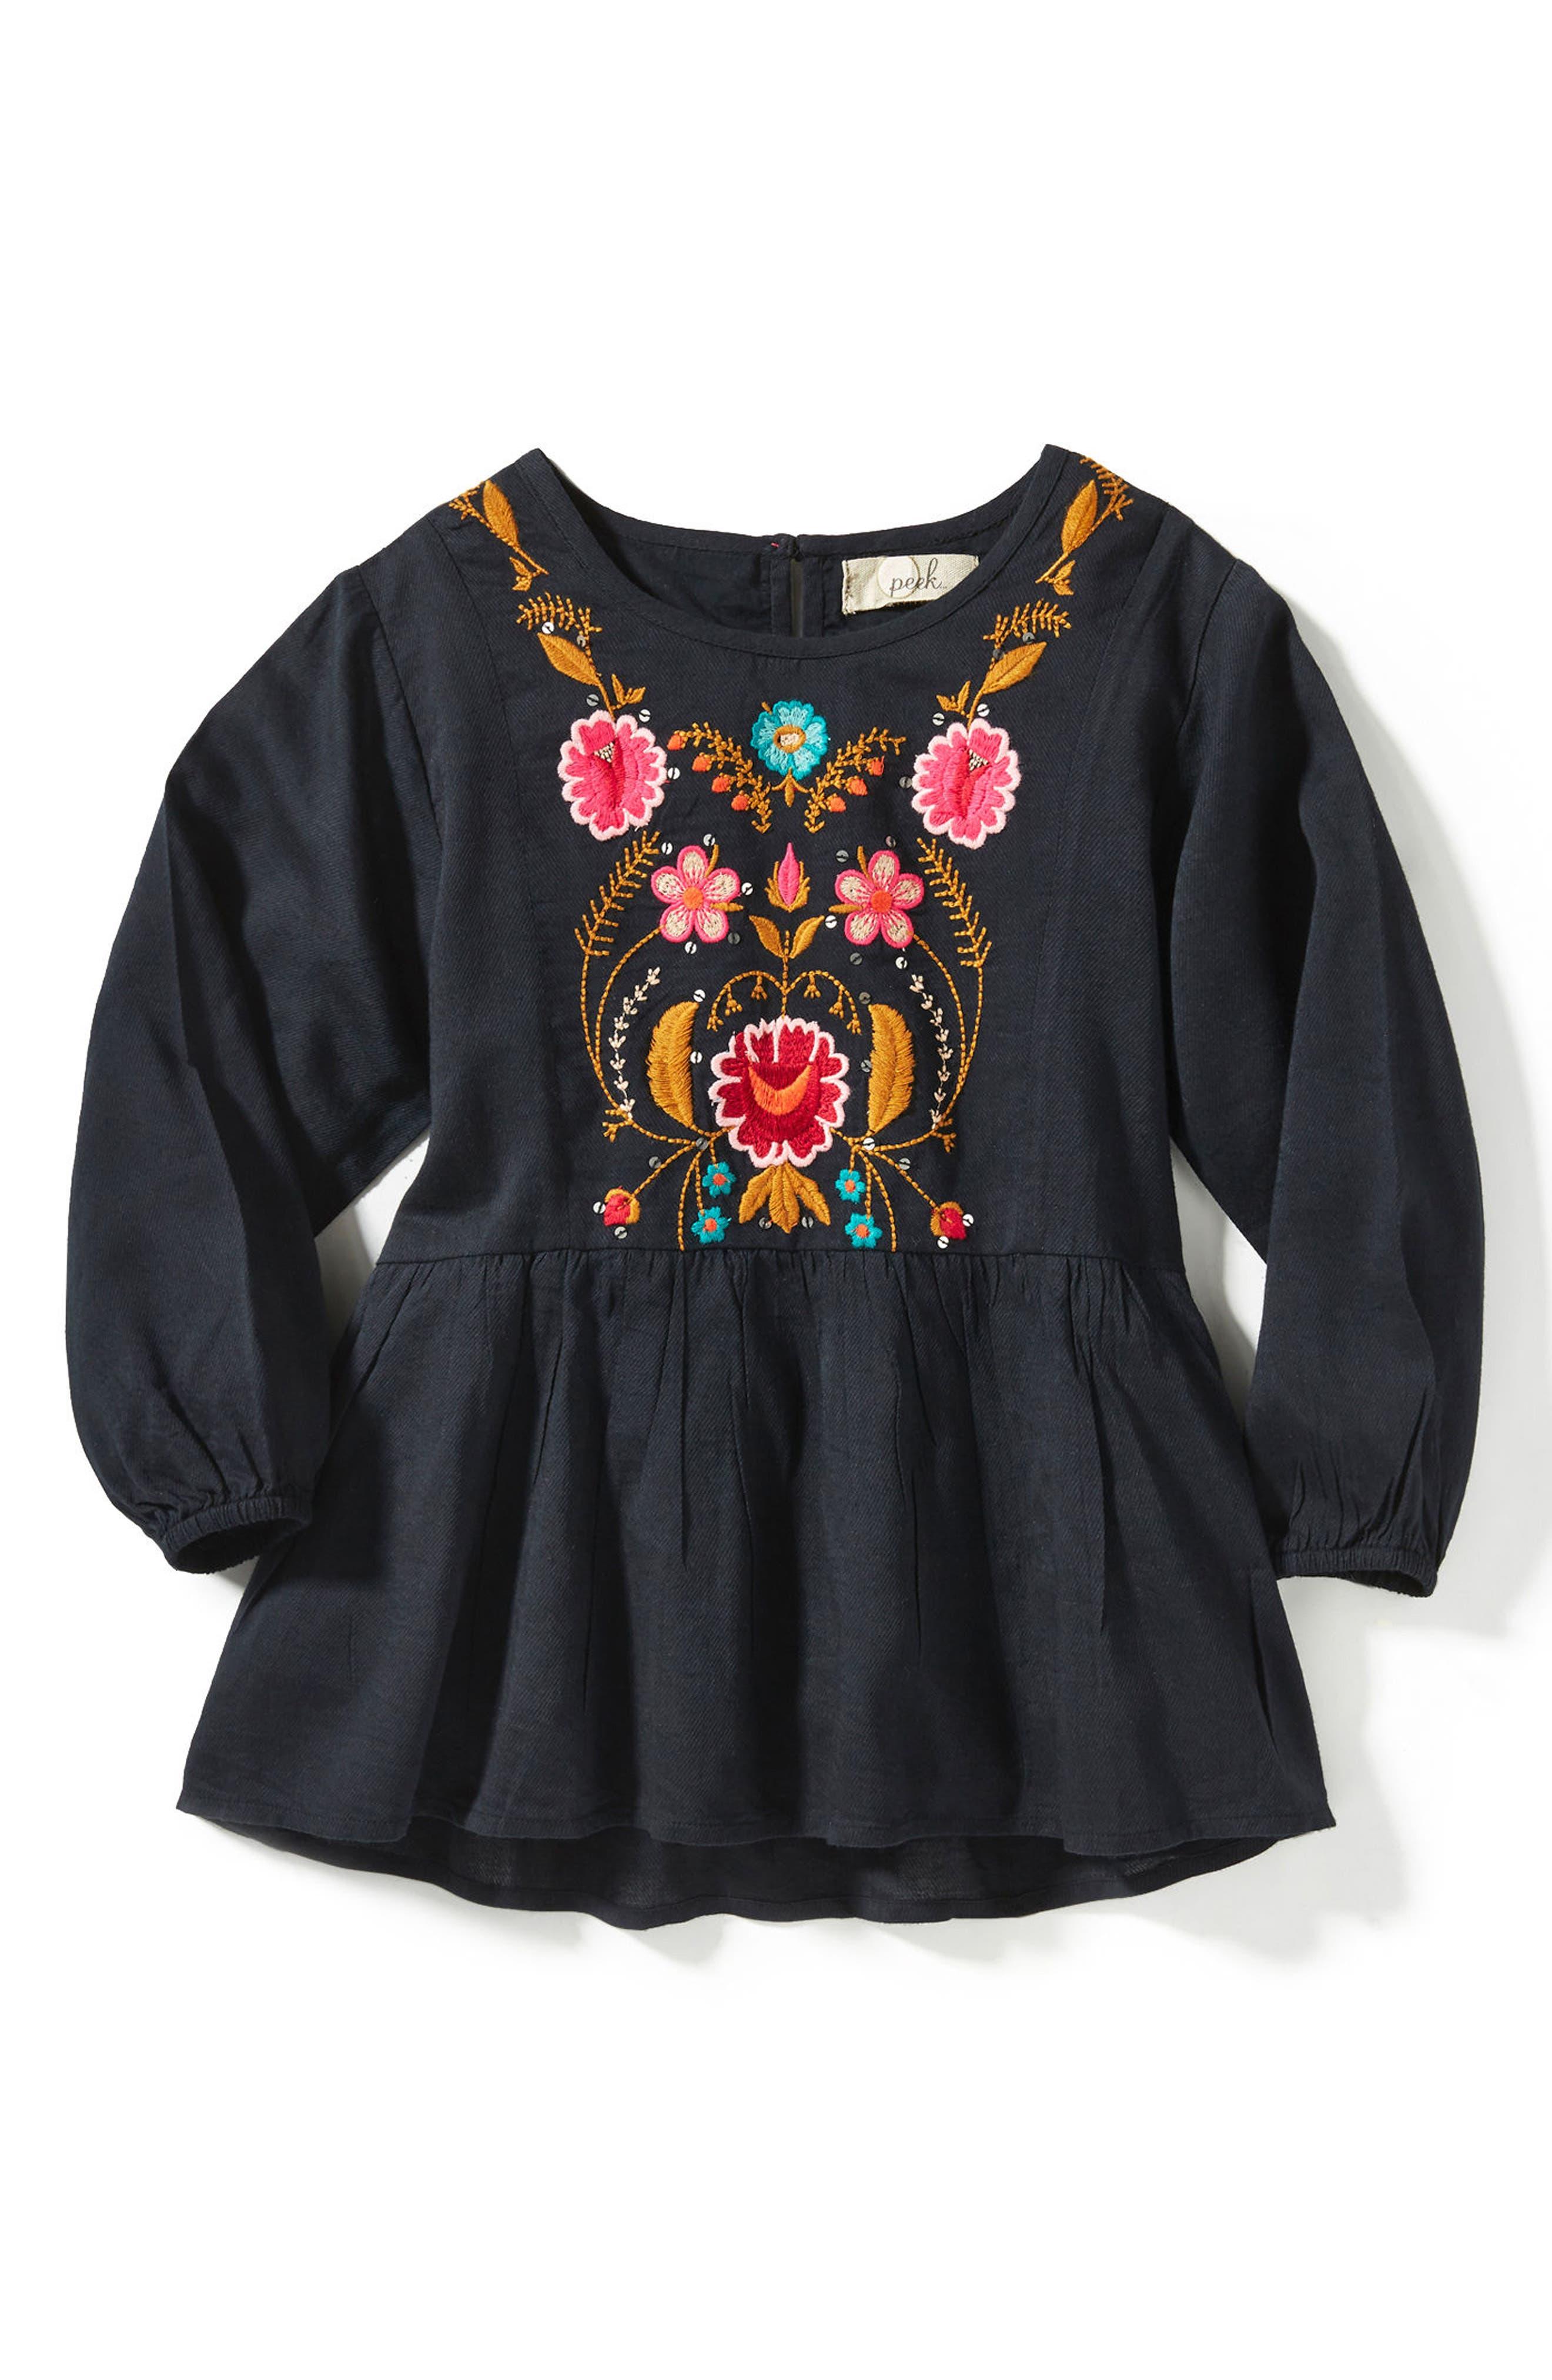 Peek Emma Embroidered Top (Toddler Girls, Little Girls & Big Girls)